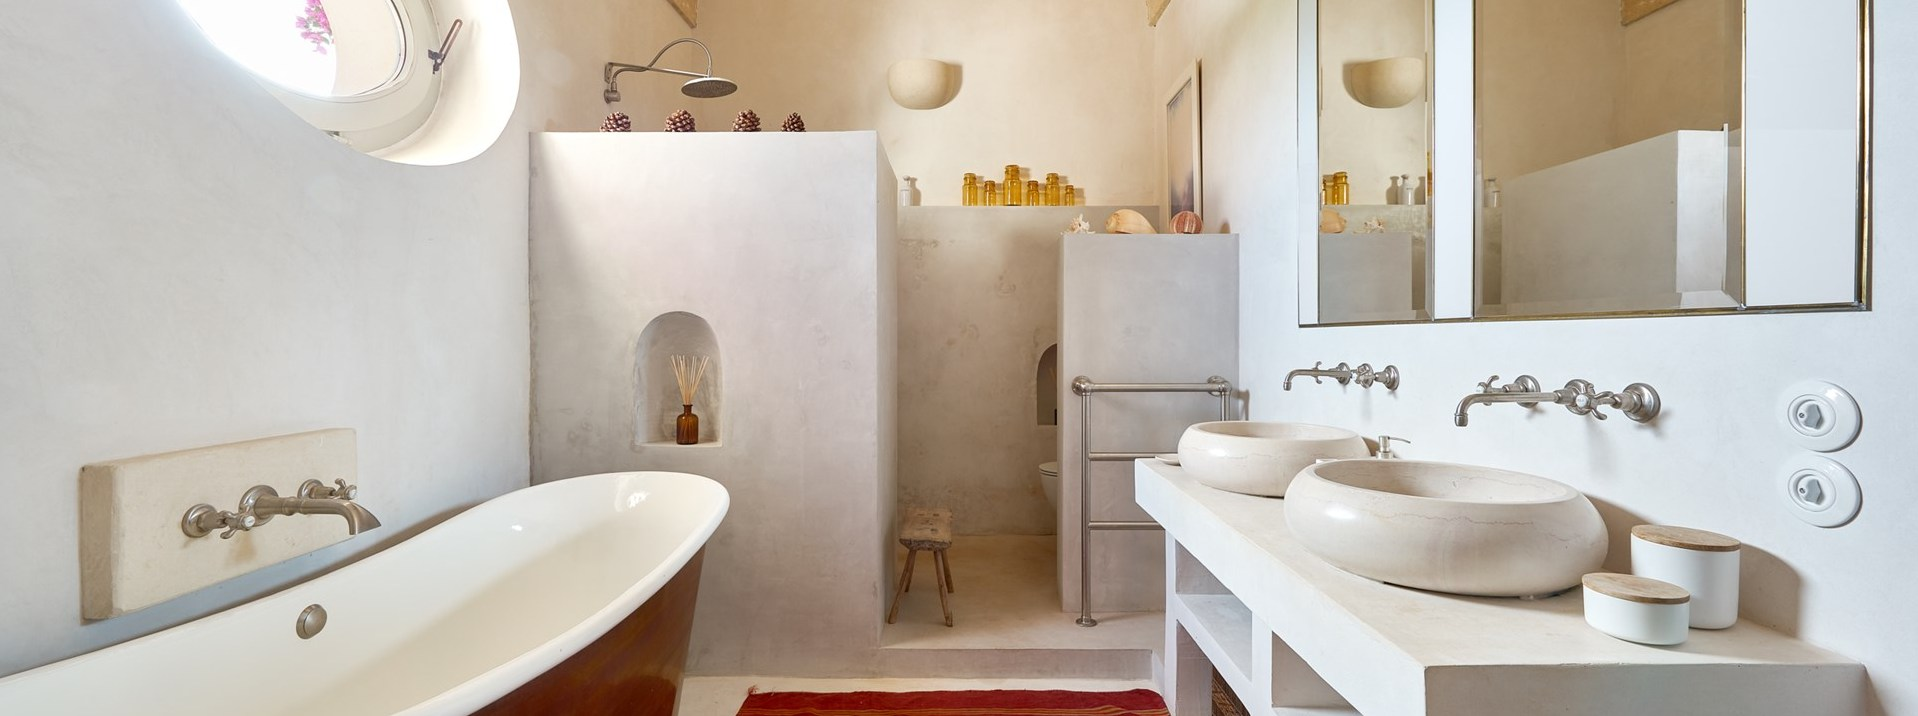 master-bedroom-en-suite-bathroom